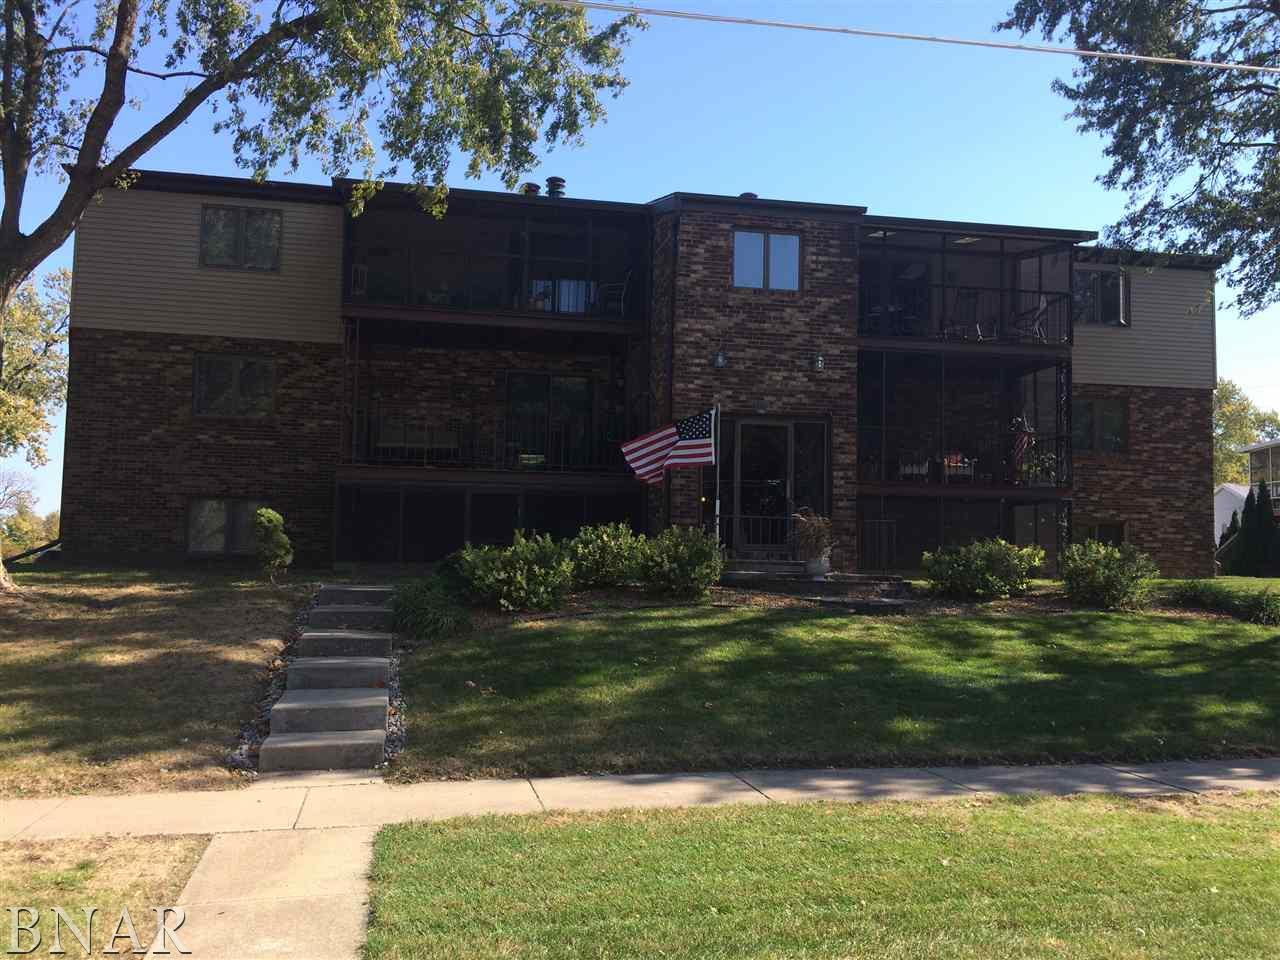 824 McGregor St, Bloomington, IL 61701